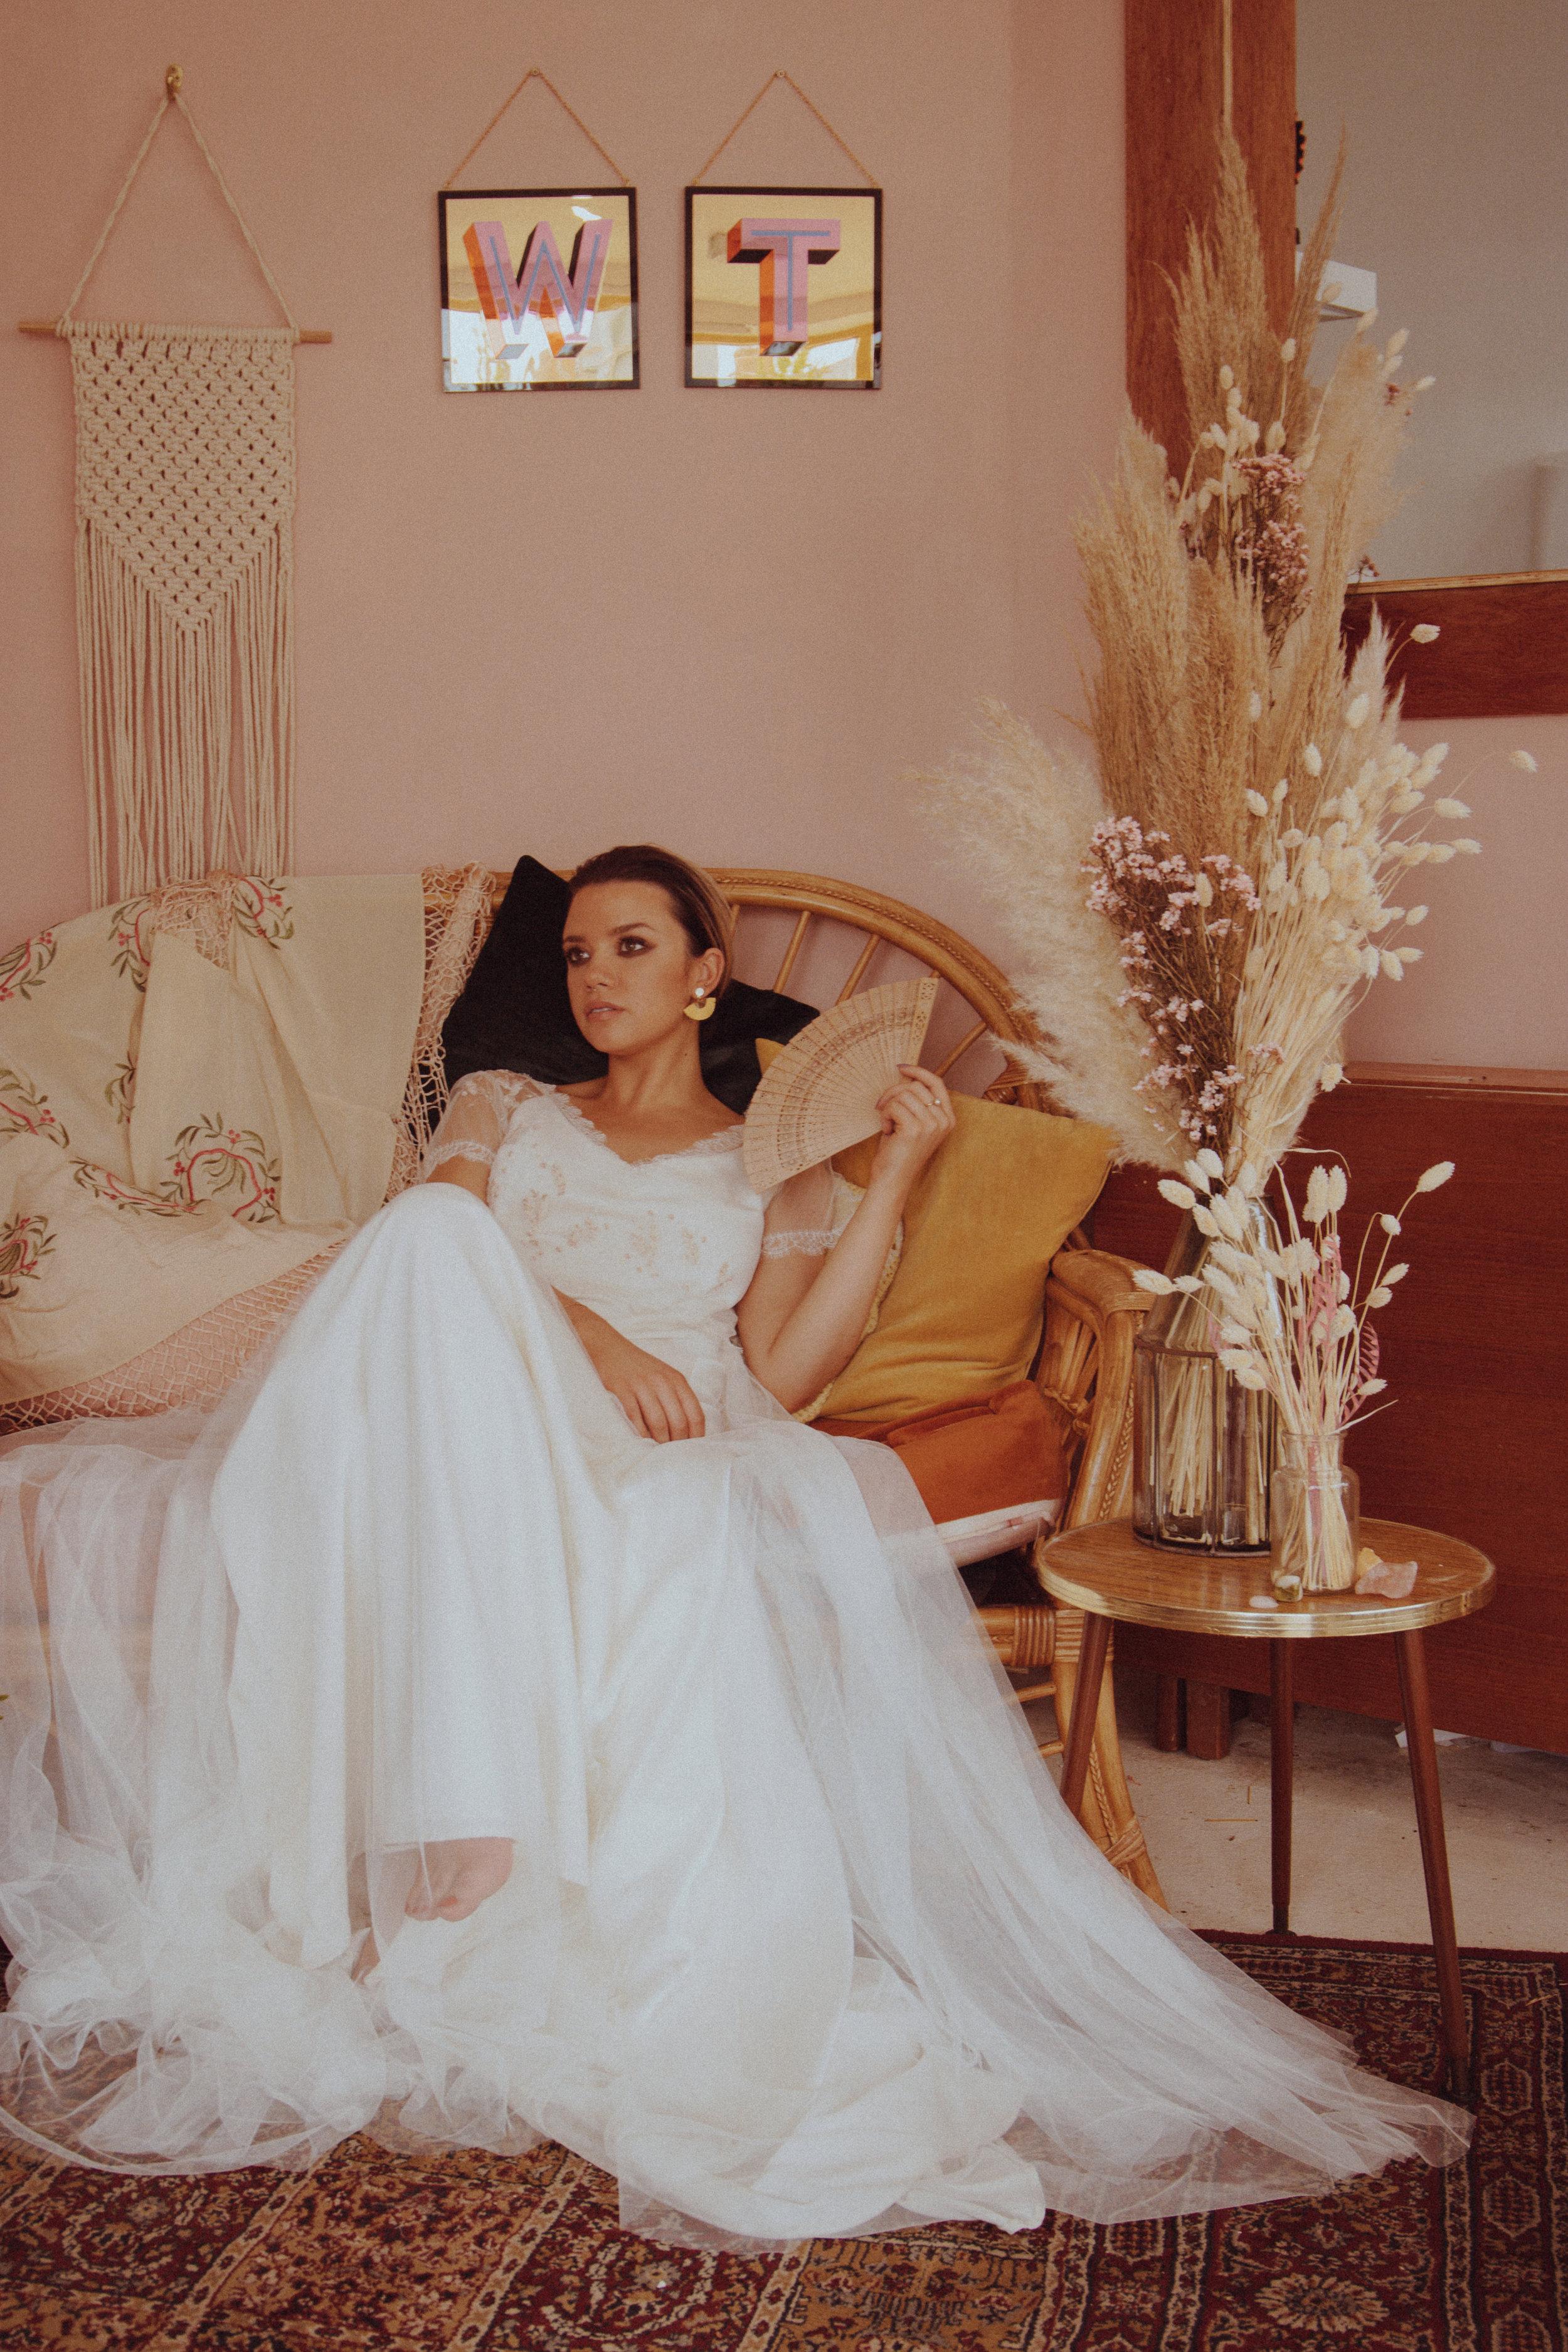 Rachel Burgess Bridal Boutique - Lovebird. Photo by Mefus Photography. #1jpg.jpg